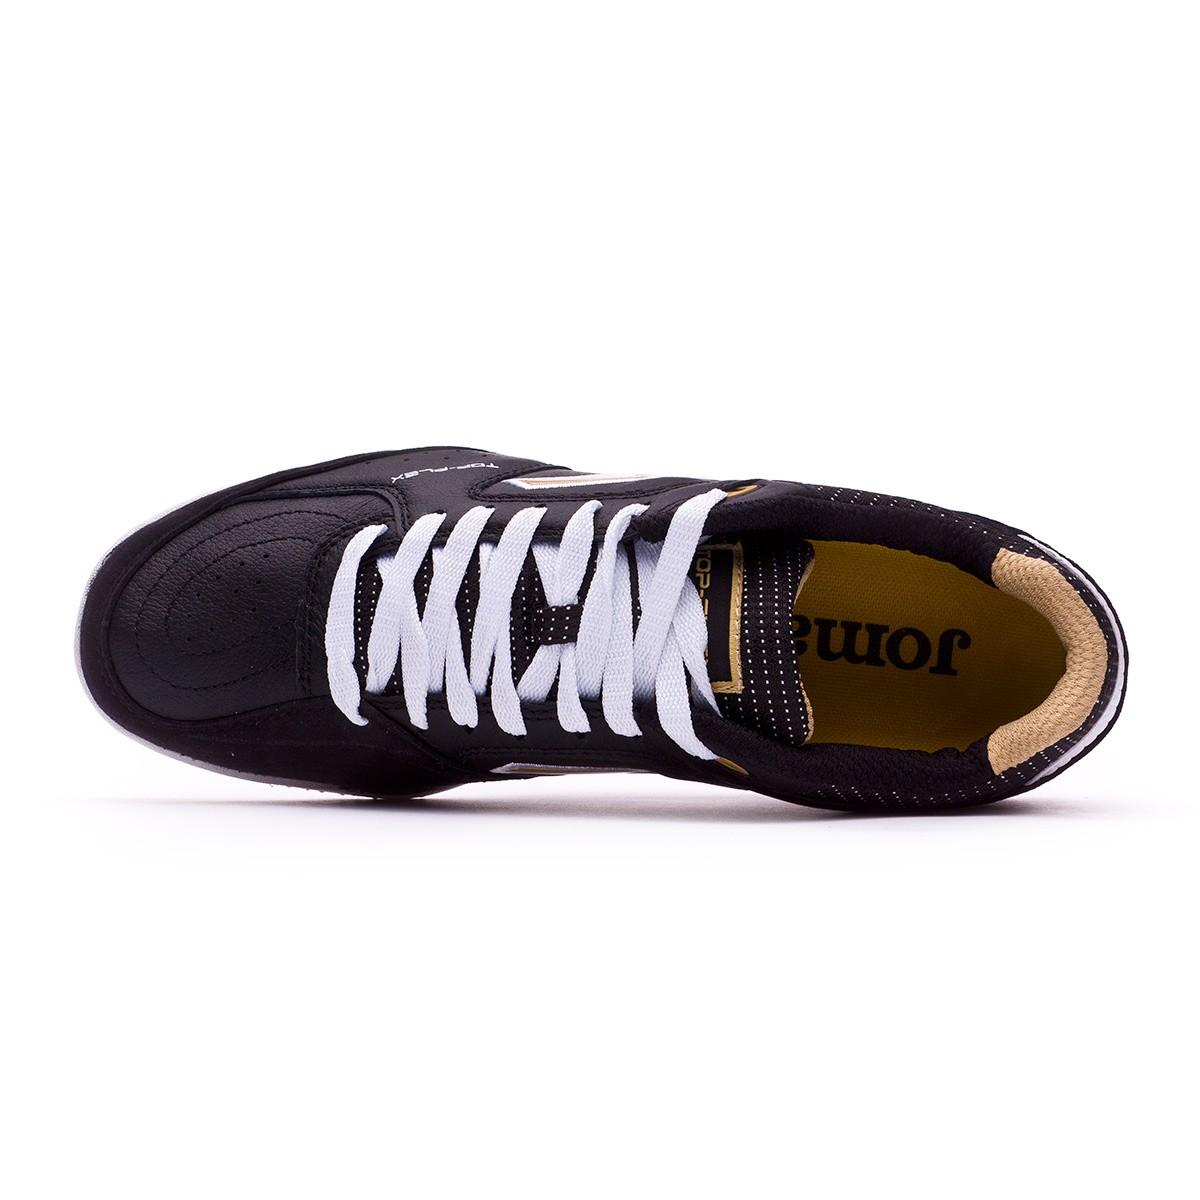 ... Zapatilla Top Flex Turf Black-Gold. CATEGORY. Football Boots · Joma  Boots cbf1a216d8ad6